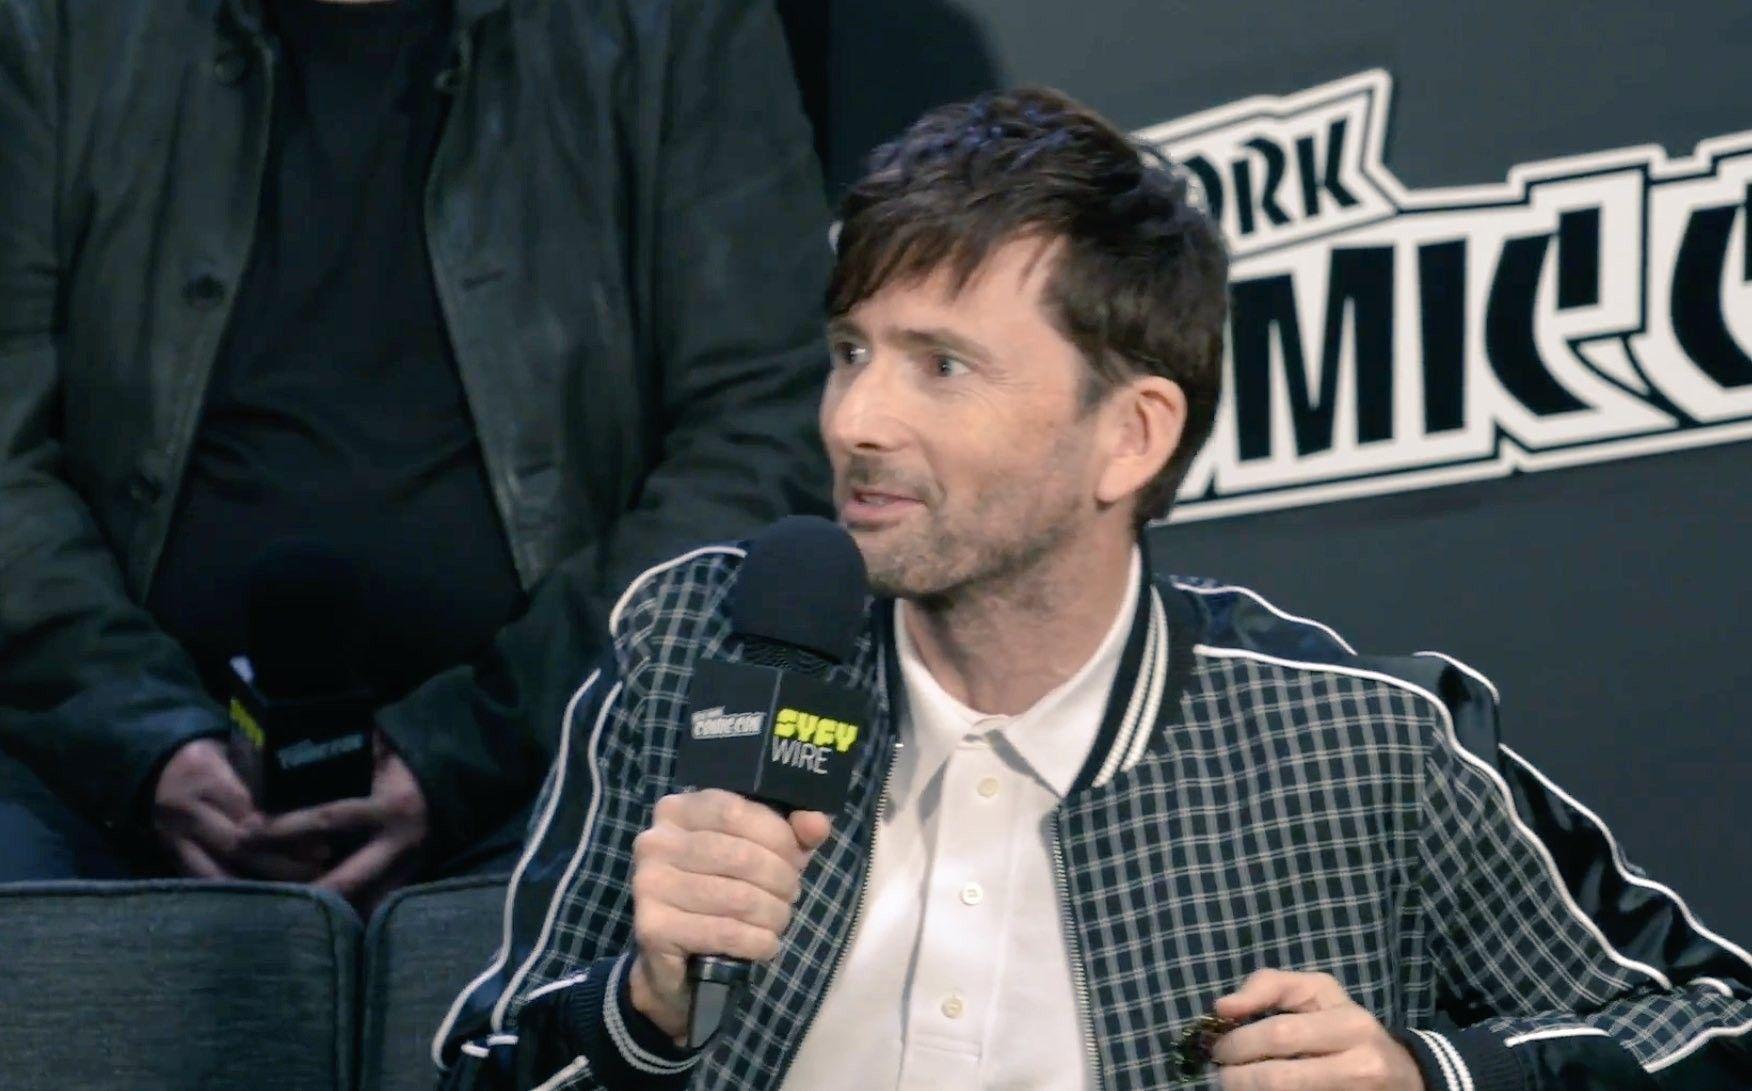 David Tennant interview at the NYCC Good Omens panel